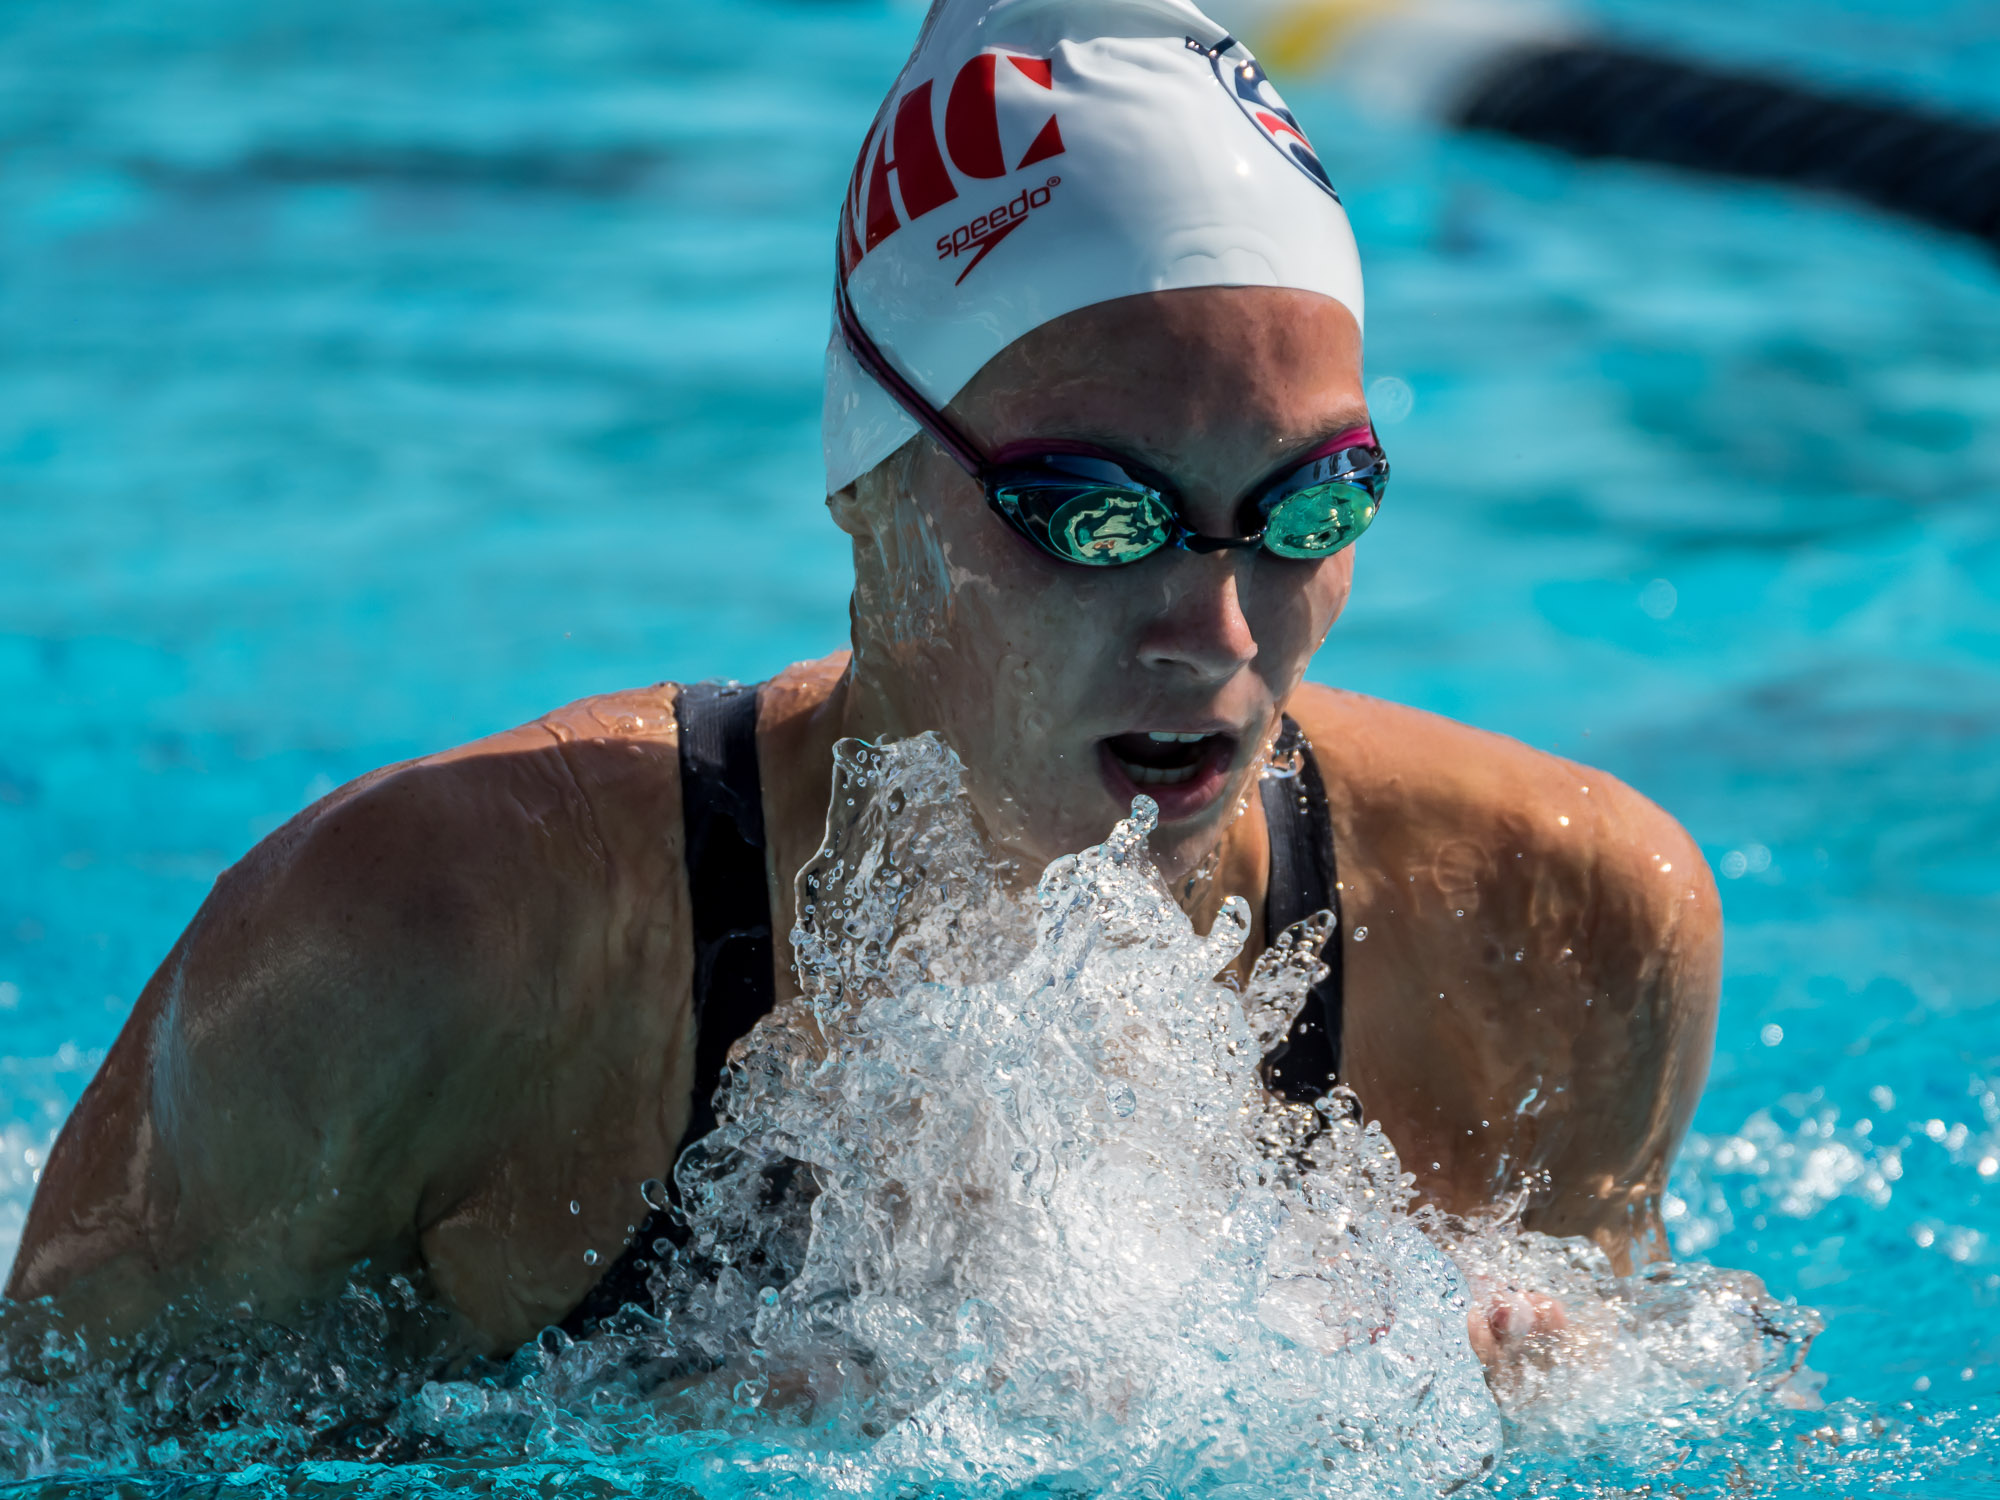 Winter Junior Nationals Swimming Cuts 2020.Usa Swimming Releases 2019 Speedo Winter Junior Time